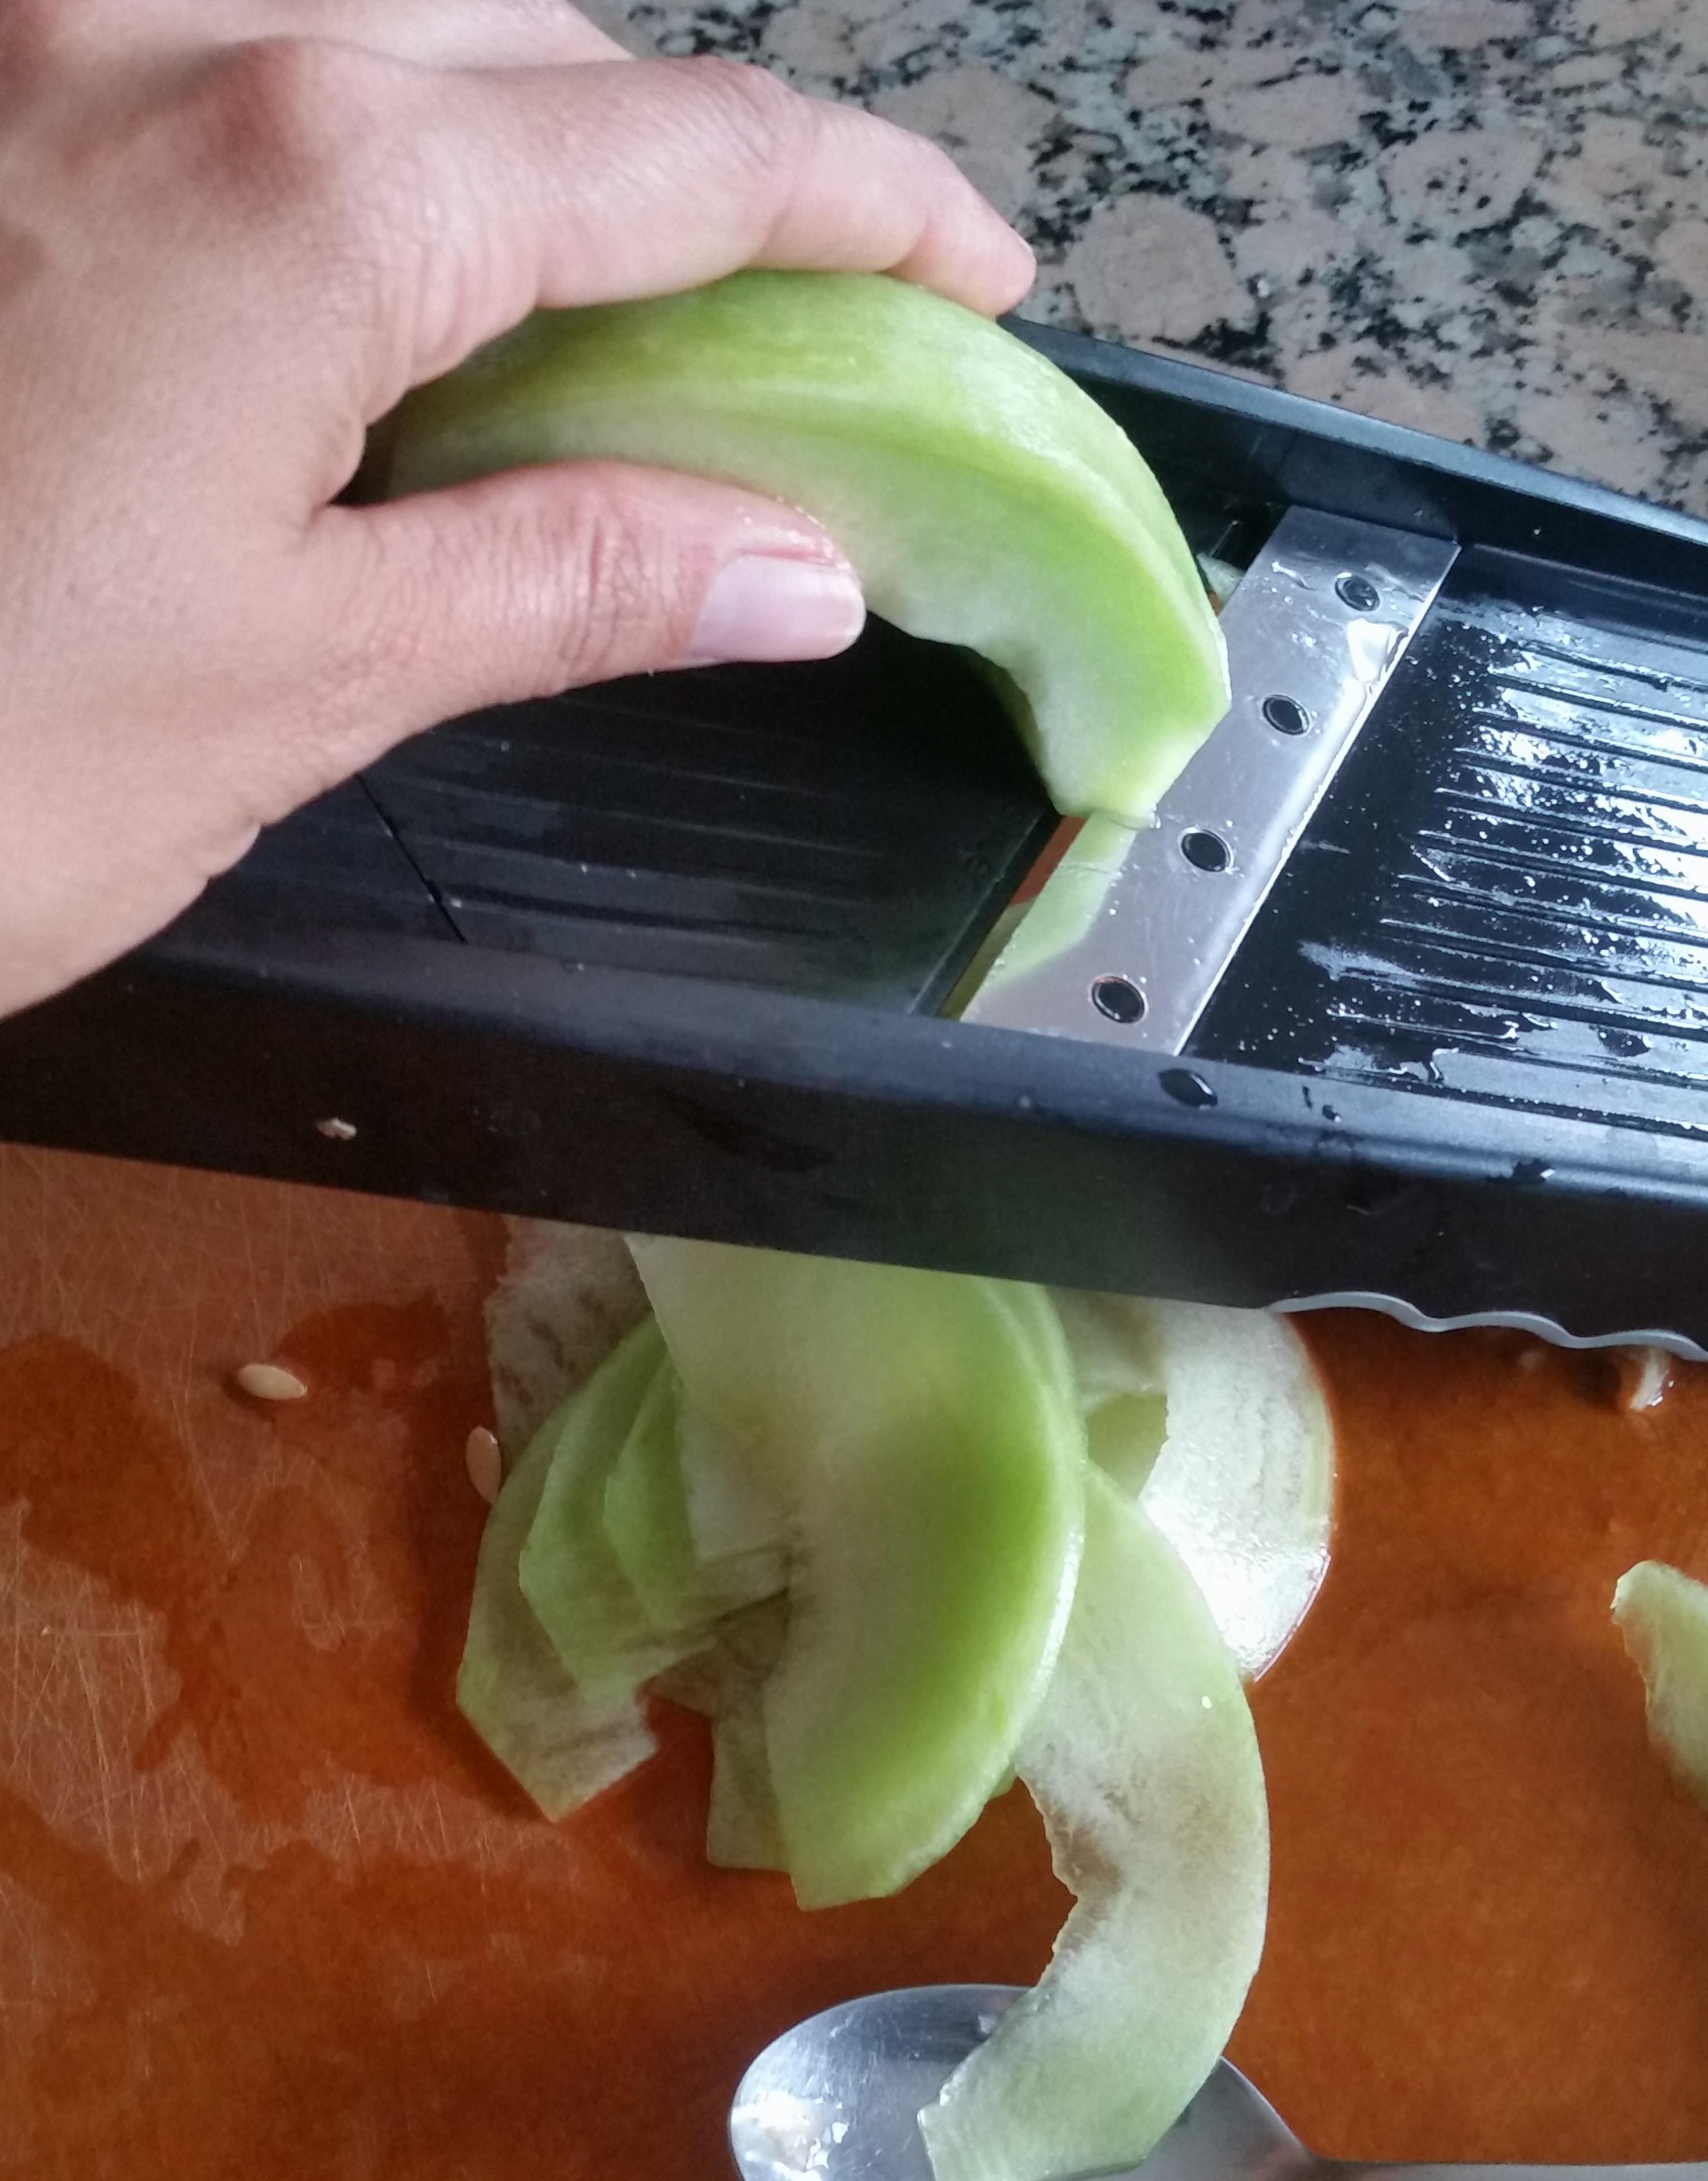 20150627 144023 e1438843636773 - Melon and White Peach Salad